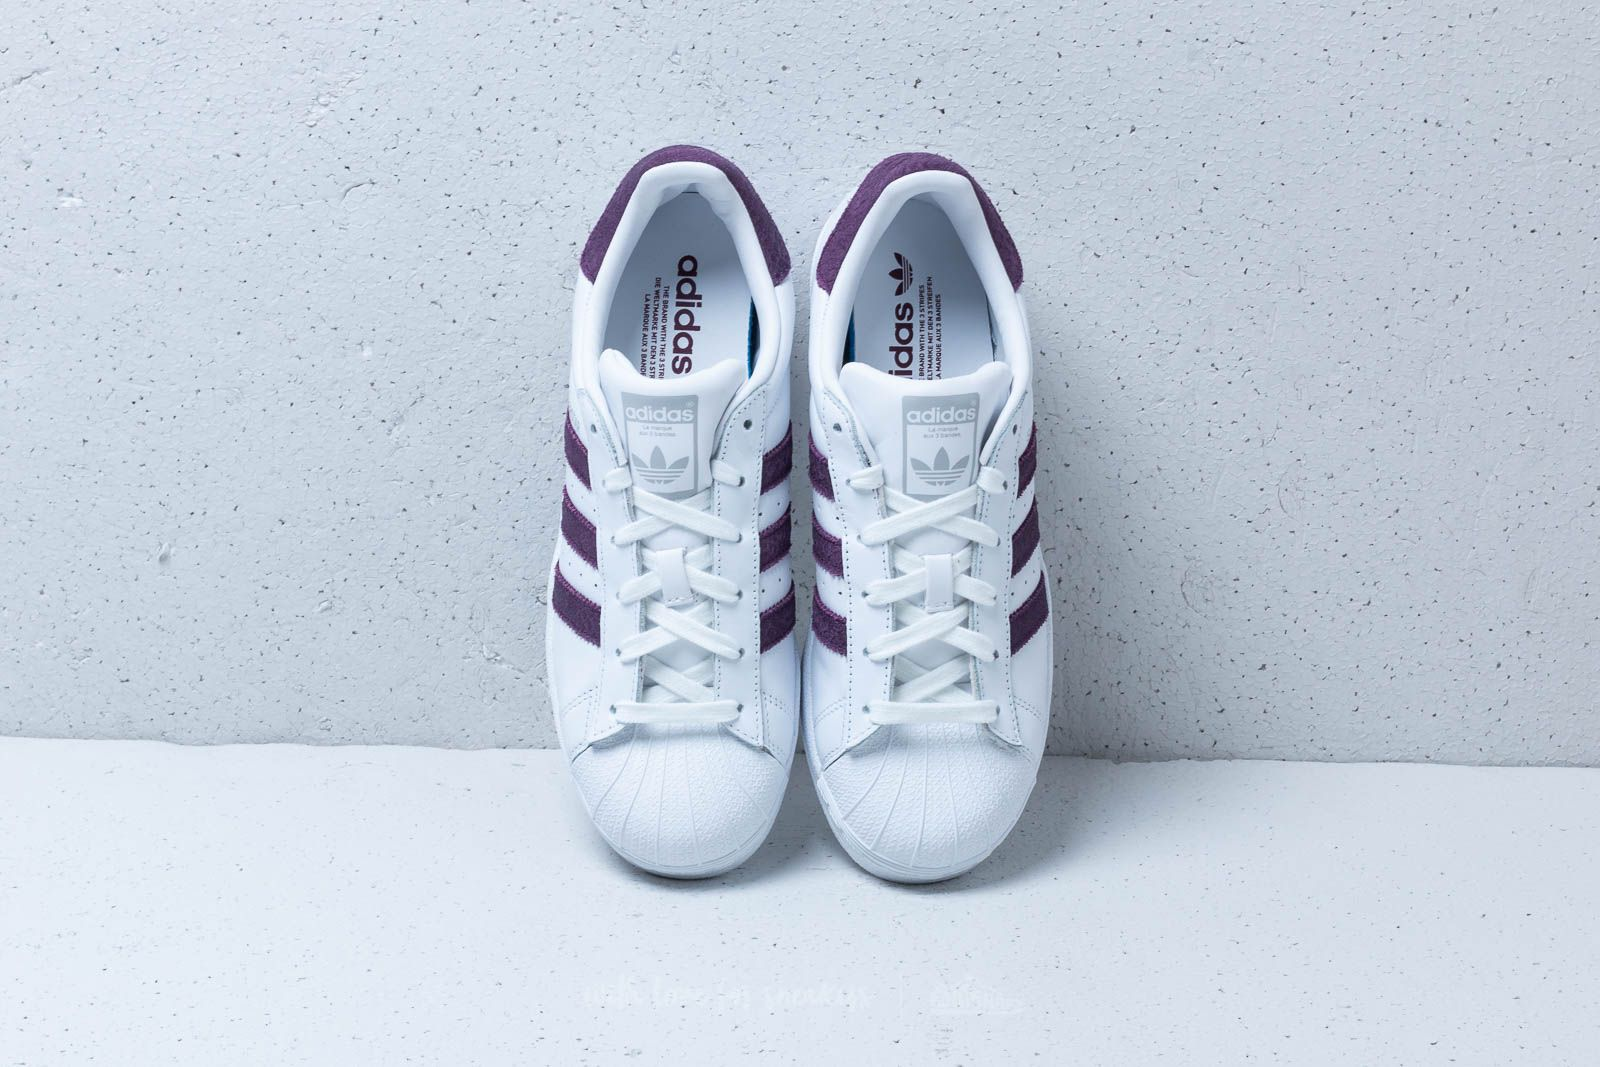 timeless design 2c7f1 c2148 adidas Superstar W Ftw White/ Red Night/ Silver Metallic ...